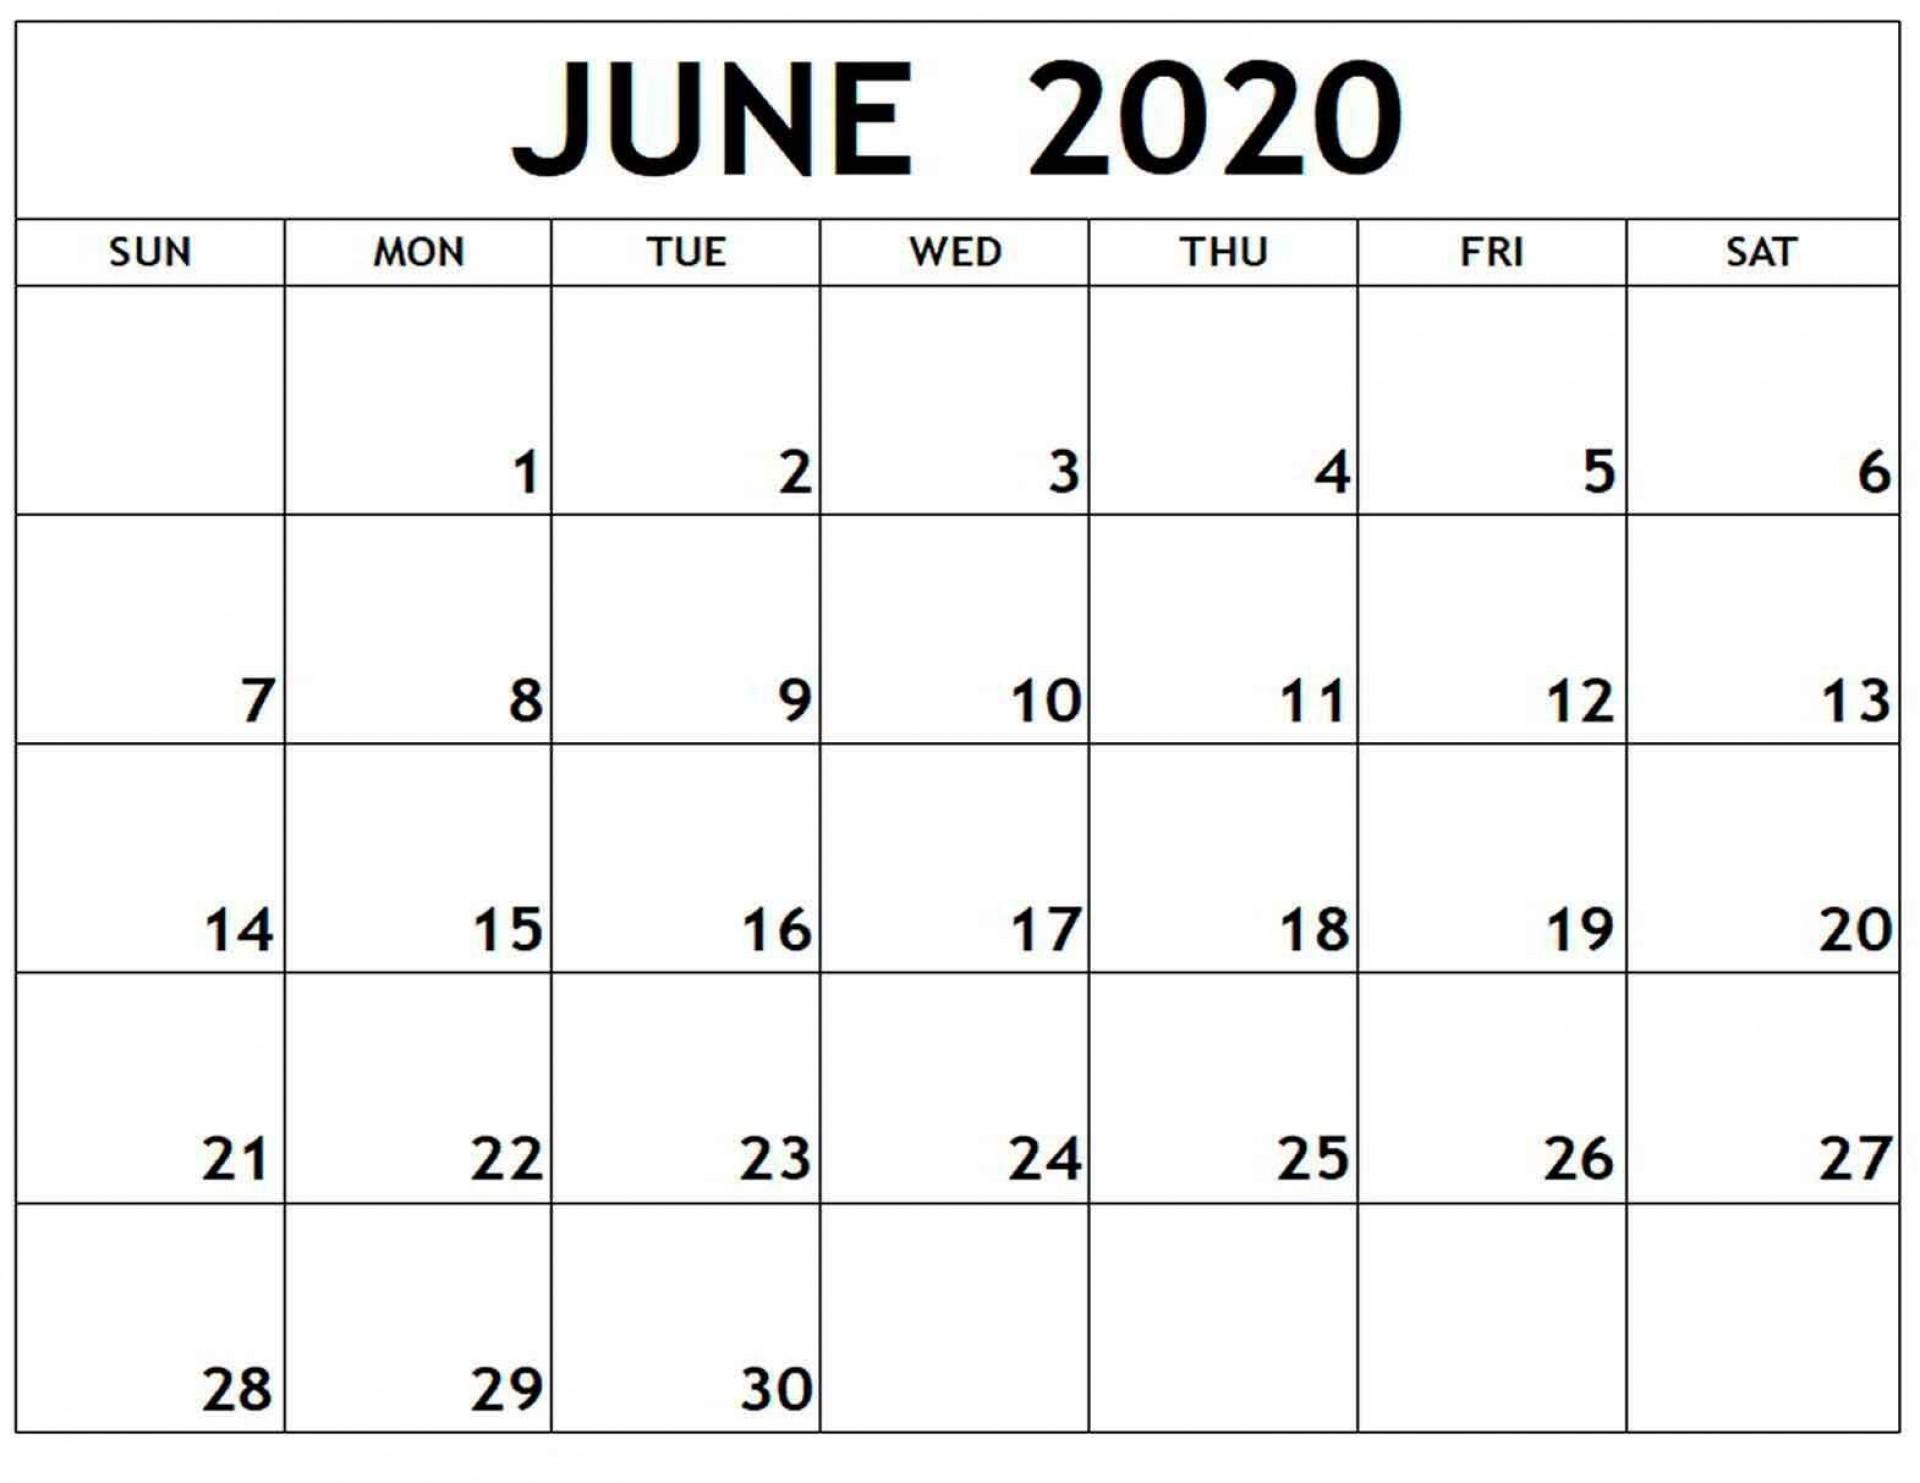 006 Fantastic Printable Calendar Template June 2020 Highest Quality  Free1920